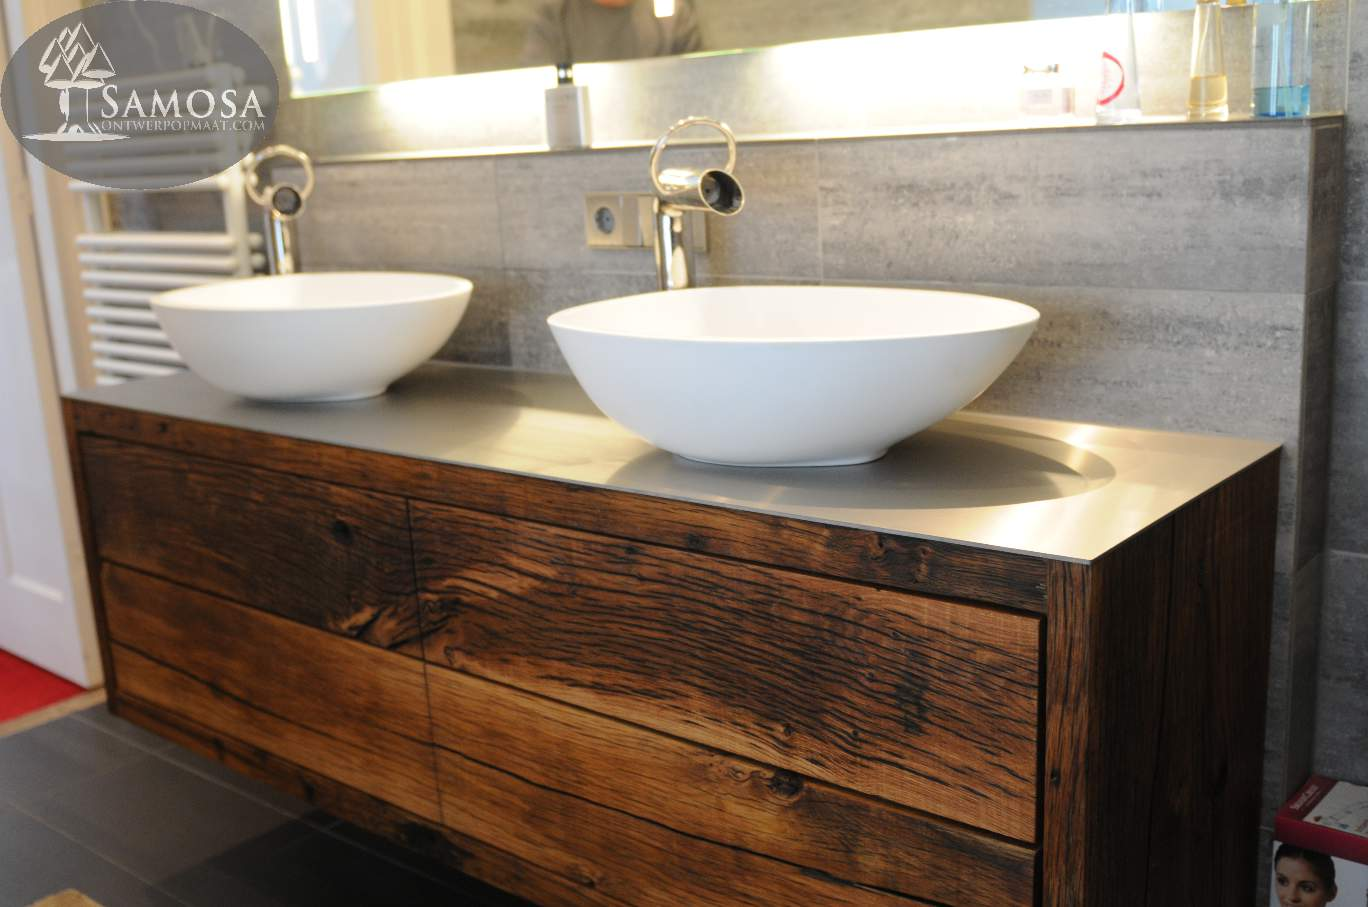 Goedkope Badkamer Assen : Ladenkastje badkamer simple badkamer ladenkastje badkamer